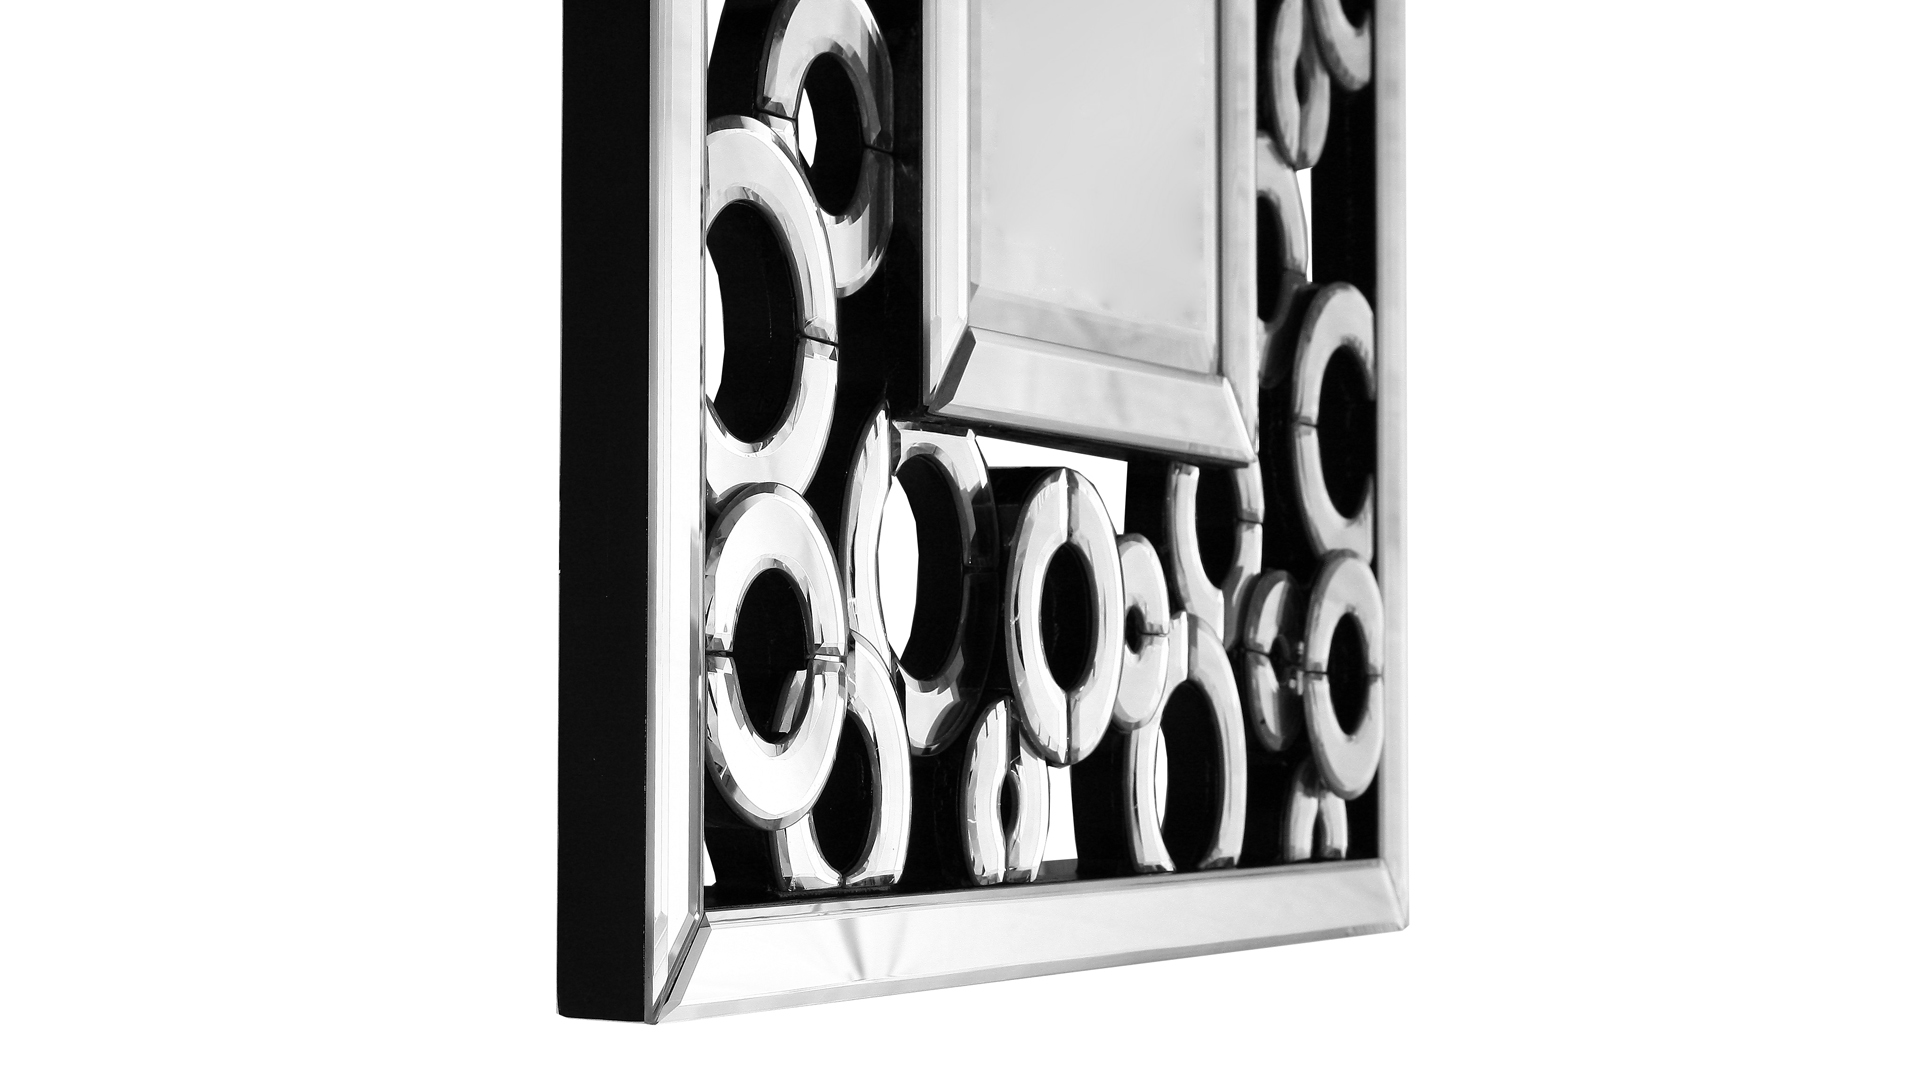 cadre photo original design simple filepicture frame cadre met jpg with cadre photo original. Black Bedroom Furniture Sets. Home Design Ideas